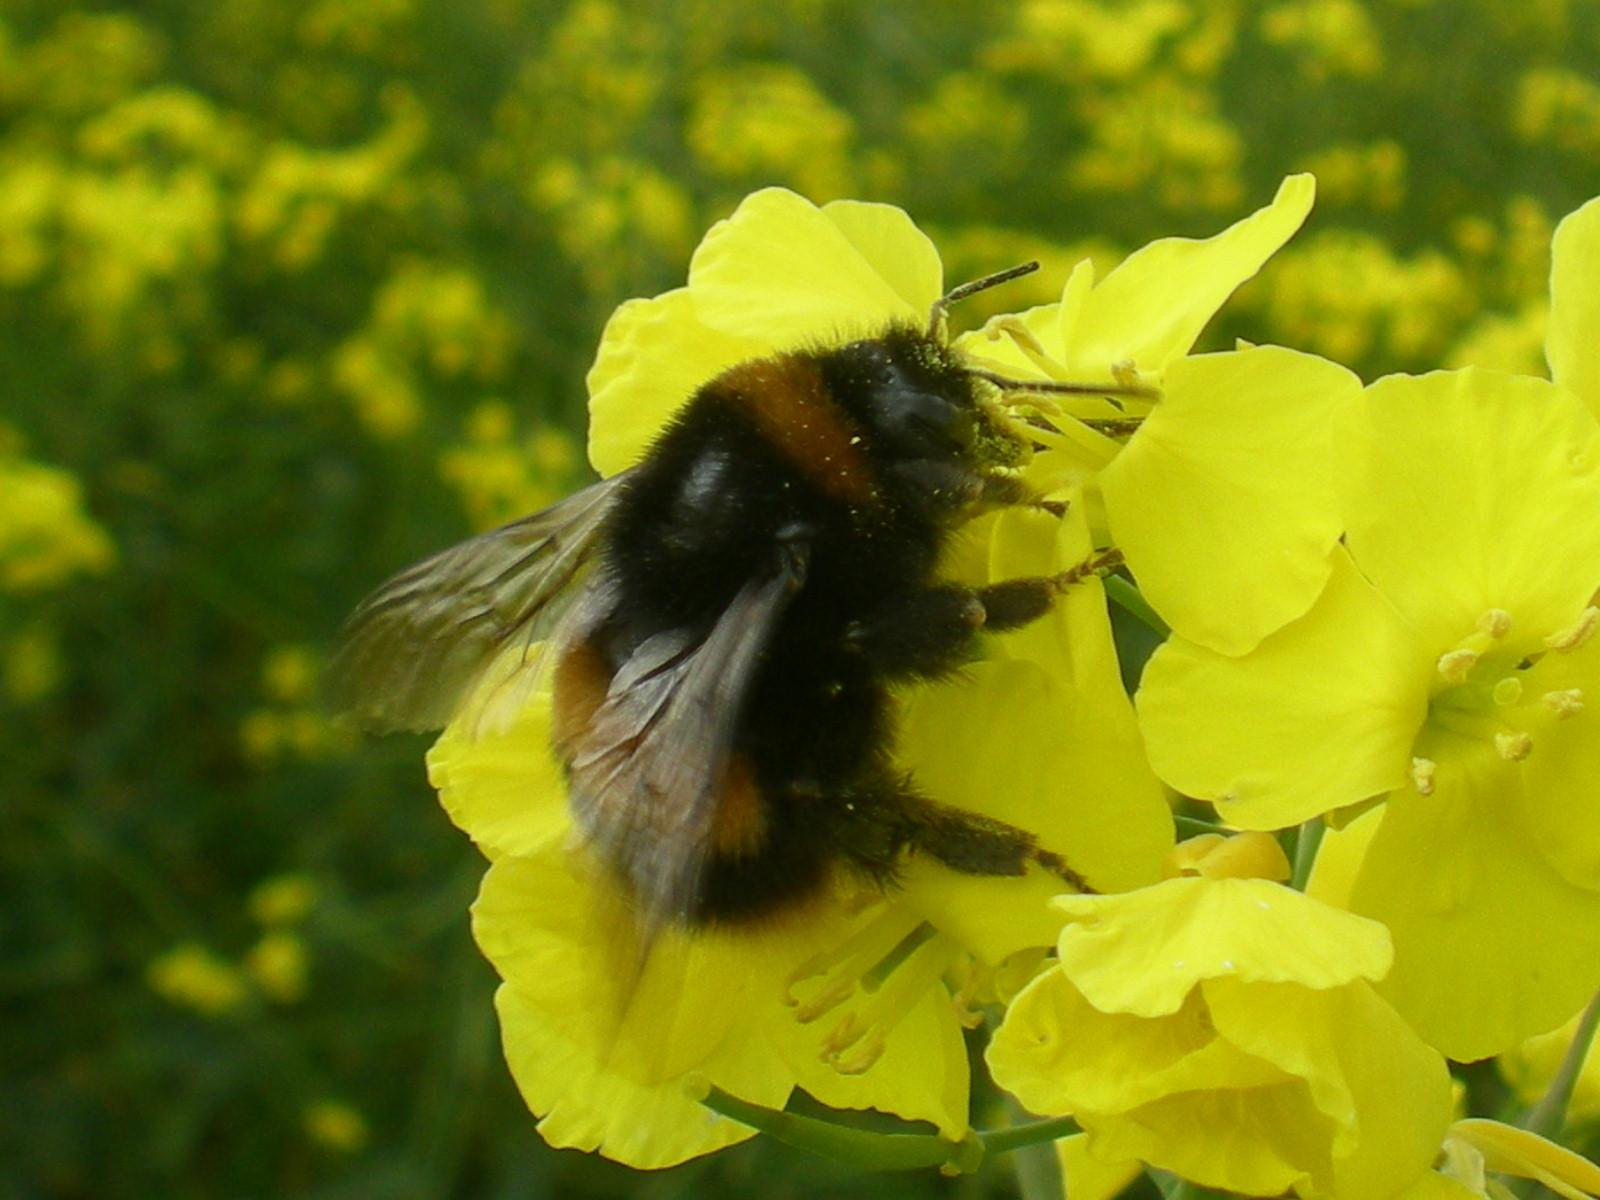 Neonic Pesticides Threaten Wild Bees Breeding Study  U